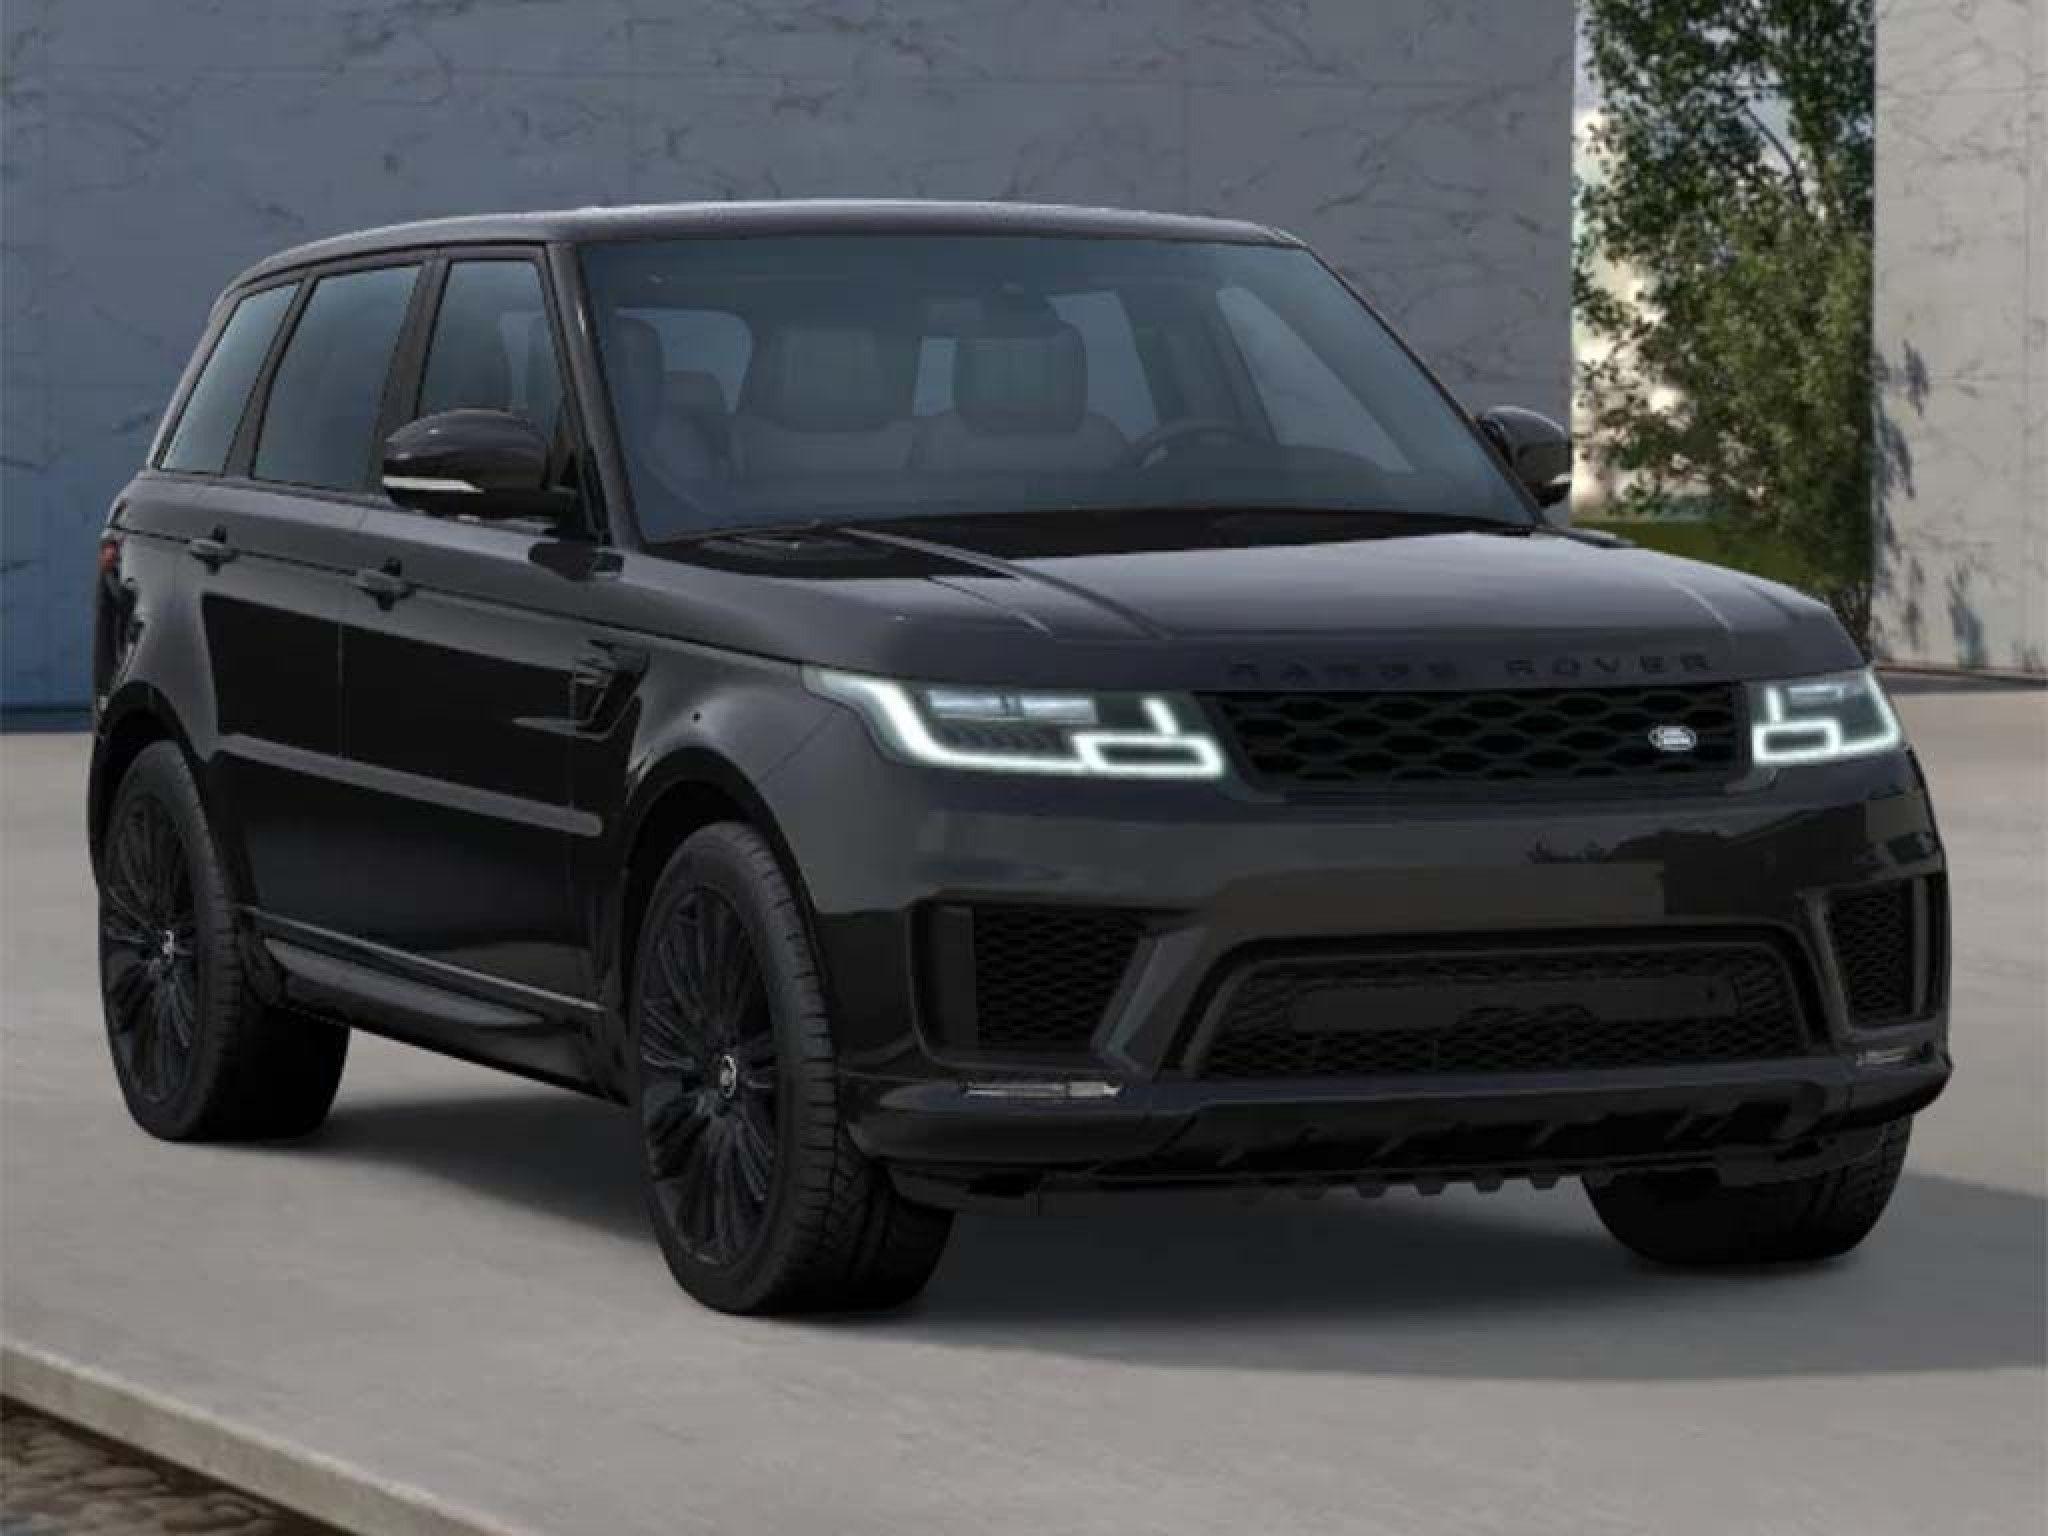 Land Rover Range Rover Sport Hse Dynamic Black 404ps Auto For Sale Range Rover Sport Black New Range Rover Sport Range Rover Sport